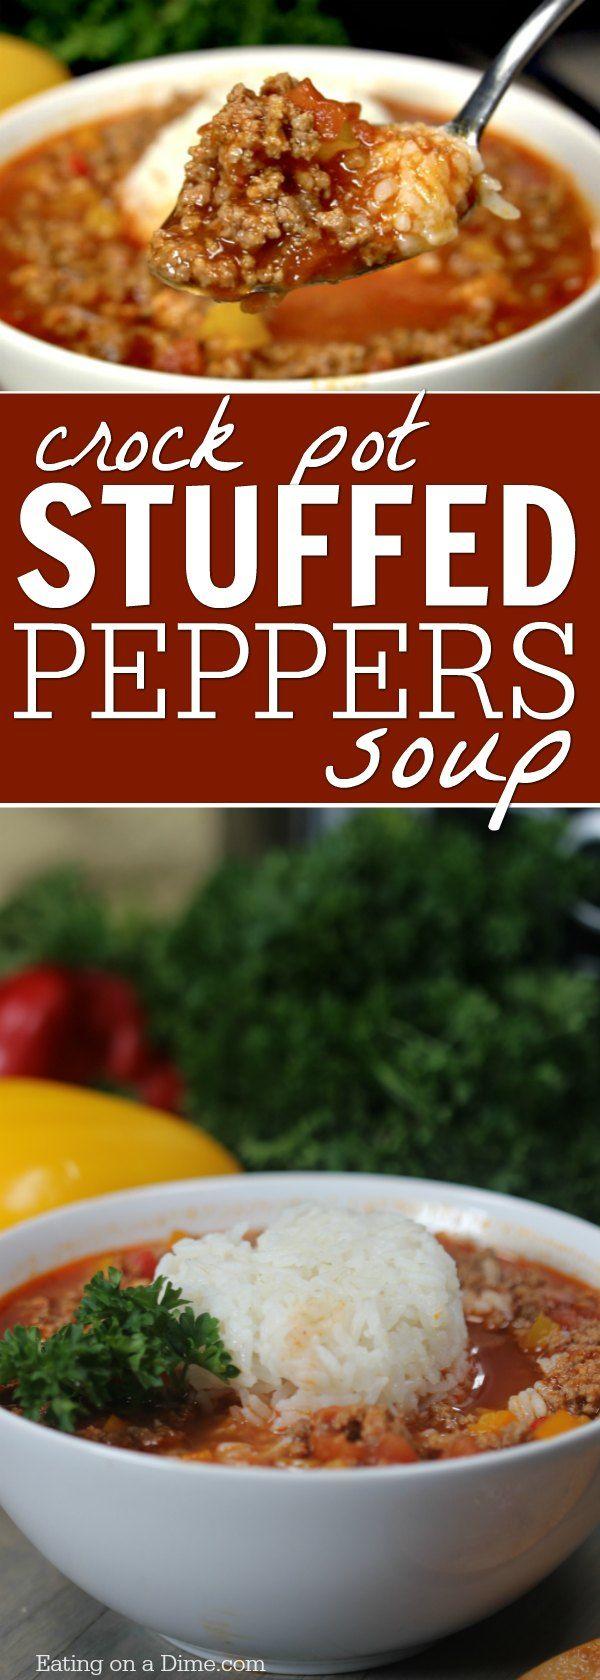 Crockpot Stuffed Peppers Soup Stuffed Pepper Soup Crock Pot Recipe Recipe Stuffed Pepper Soup Crockpot Stuffed Peppers Stuffed Peppers